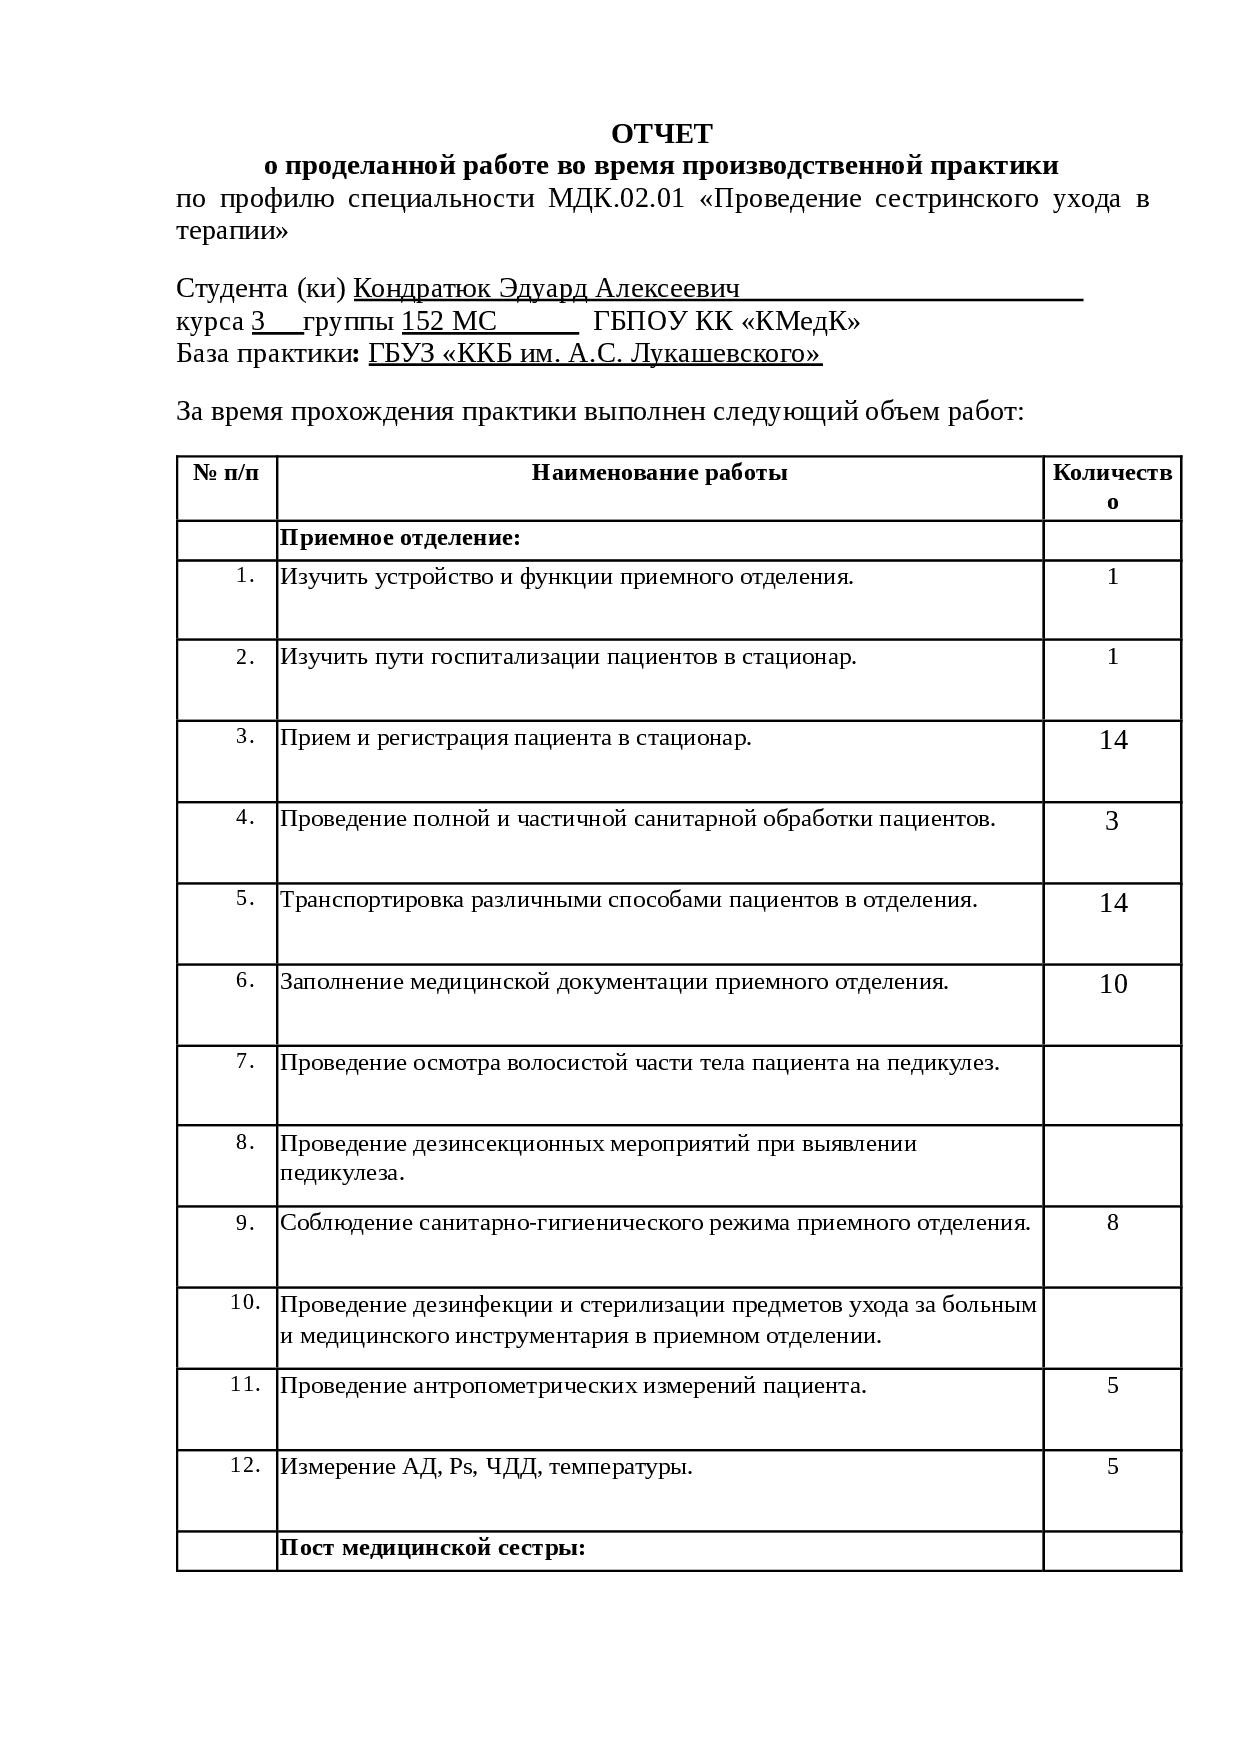 Алгоритм обработки пациента при педикулезе